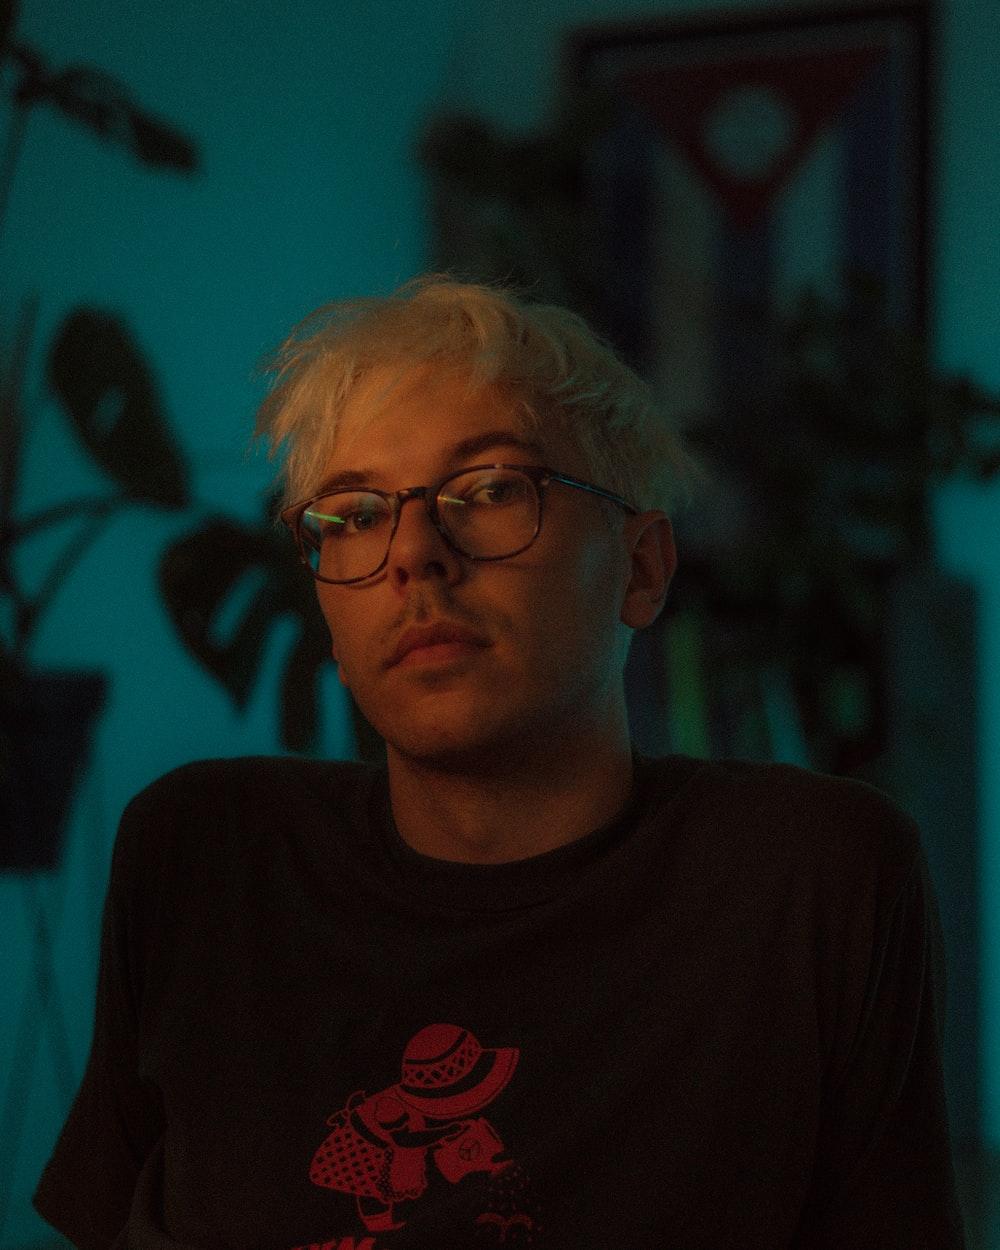 man in black crew neck shirt wearing black framed eyeglasses